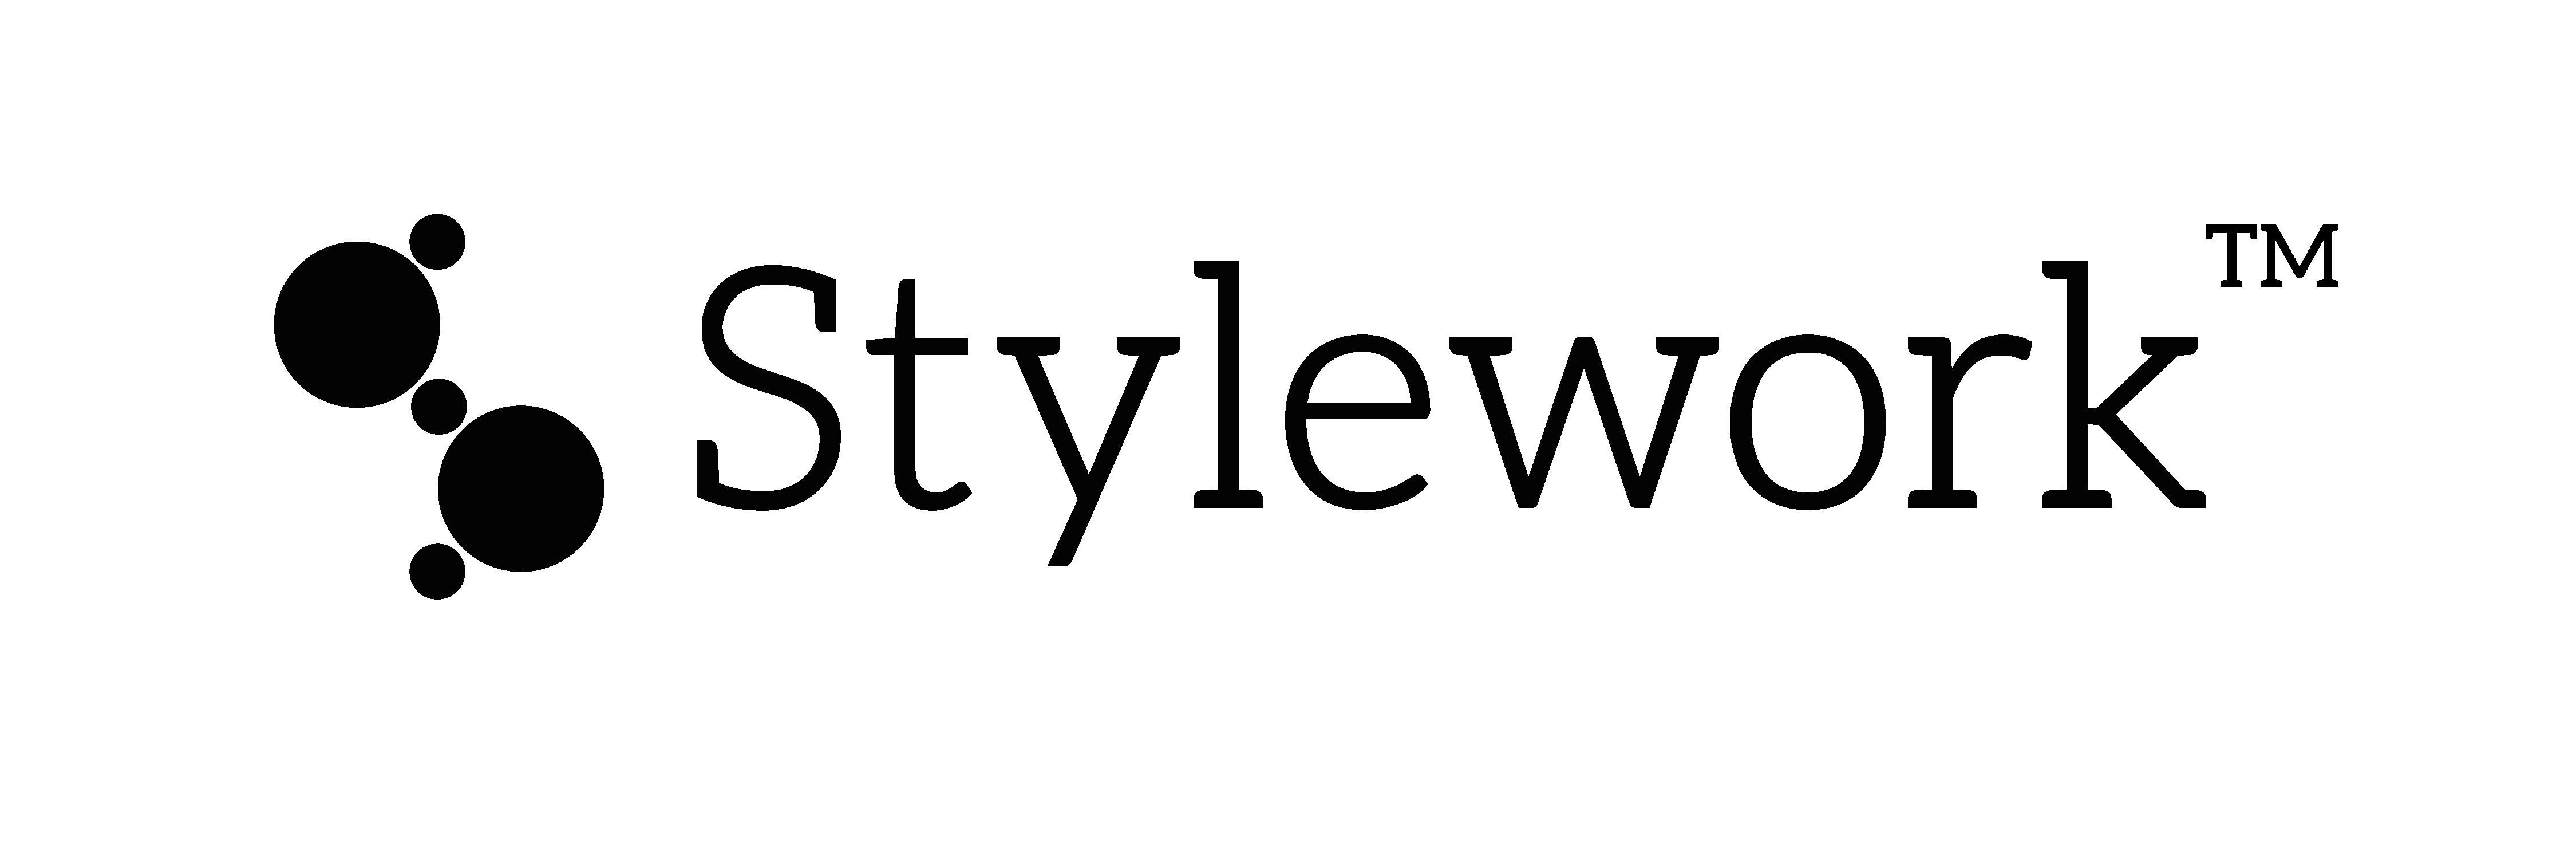 Stylework TM-01